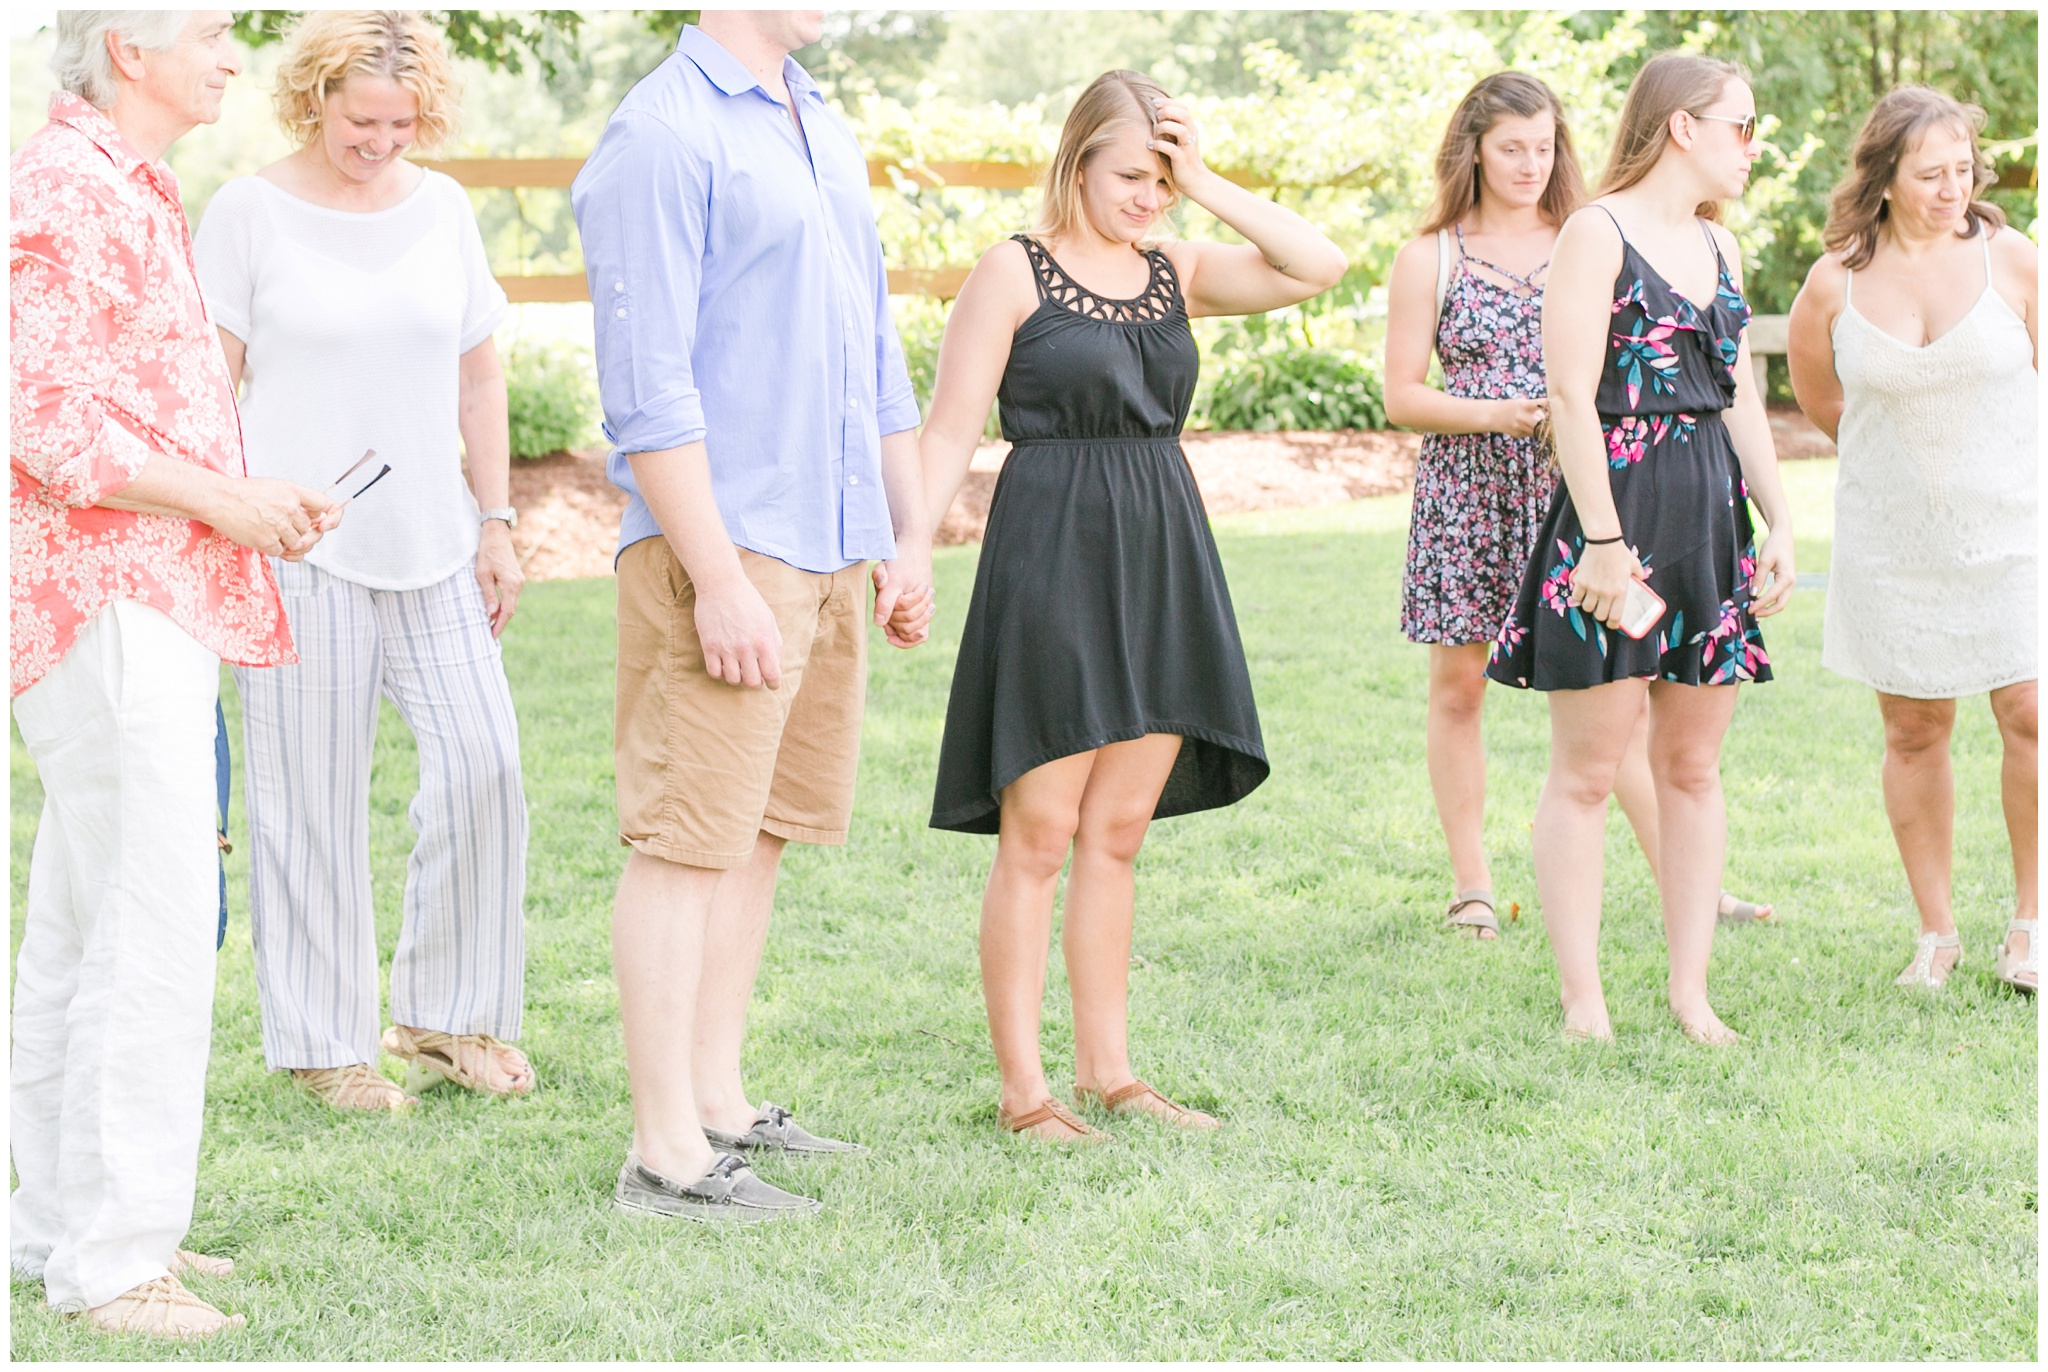 Amy-Brown-Photography-Seacoast-NH-New-Hampshire-Outdoor-Farm-Wedding_0355.jpg